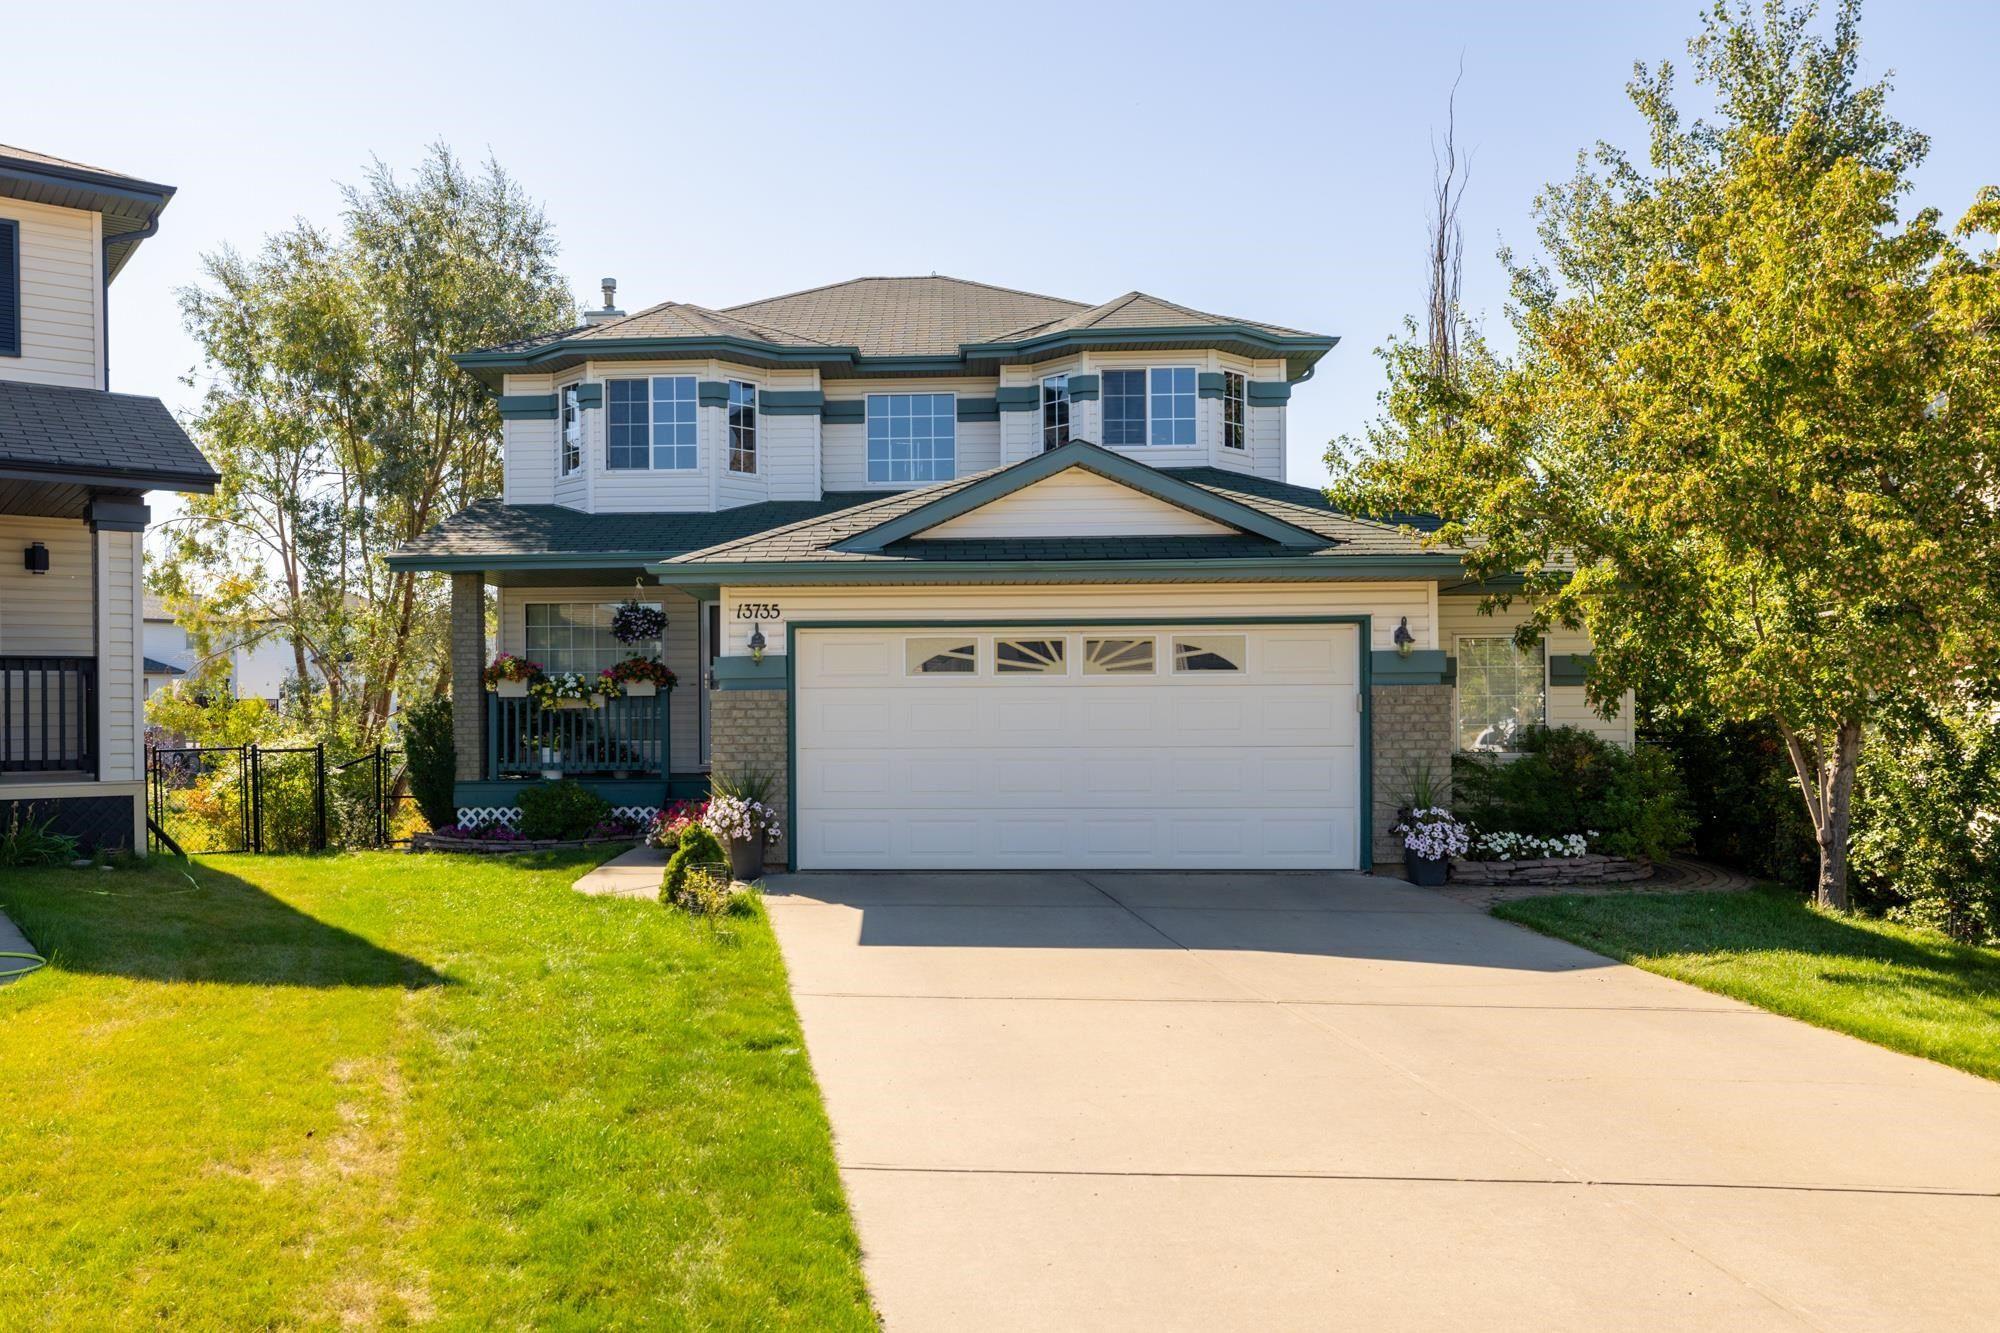 Main Photo: 13735 149 Avenue in Edmonton: Zone 27 House for sale : MLS®# E4261647